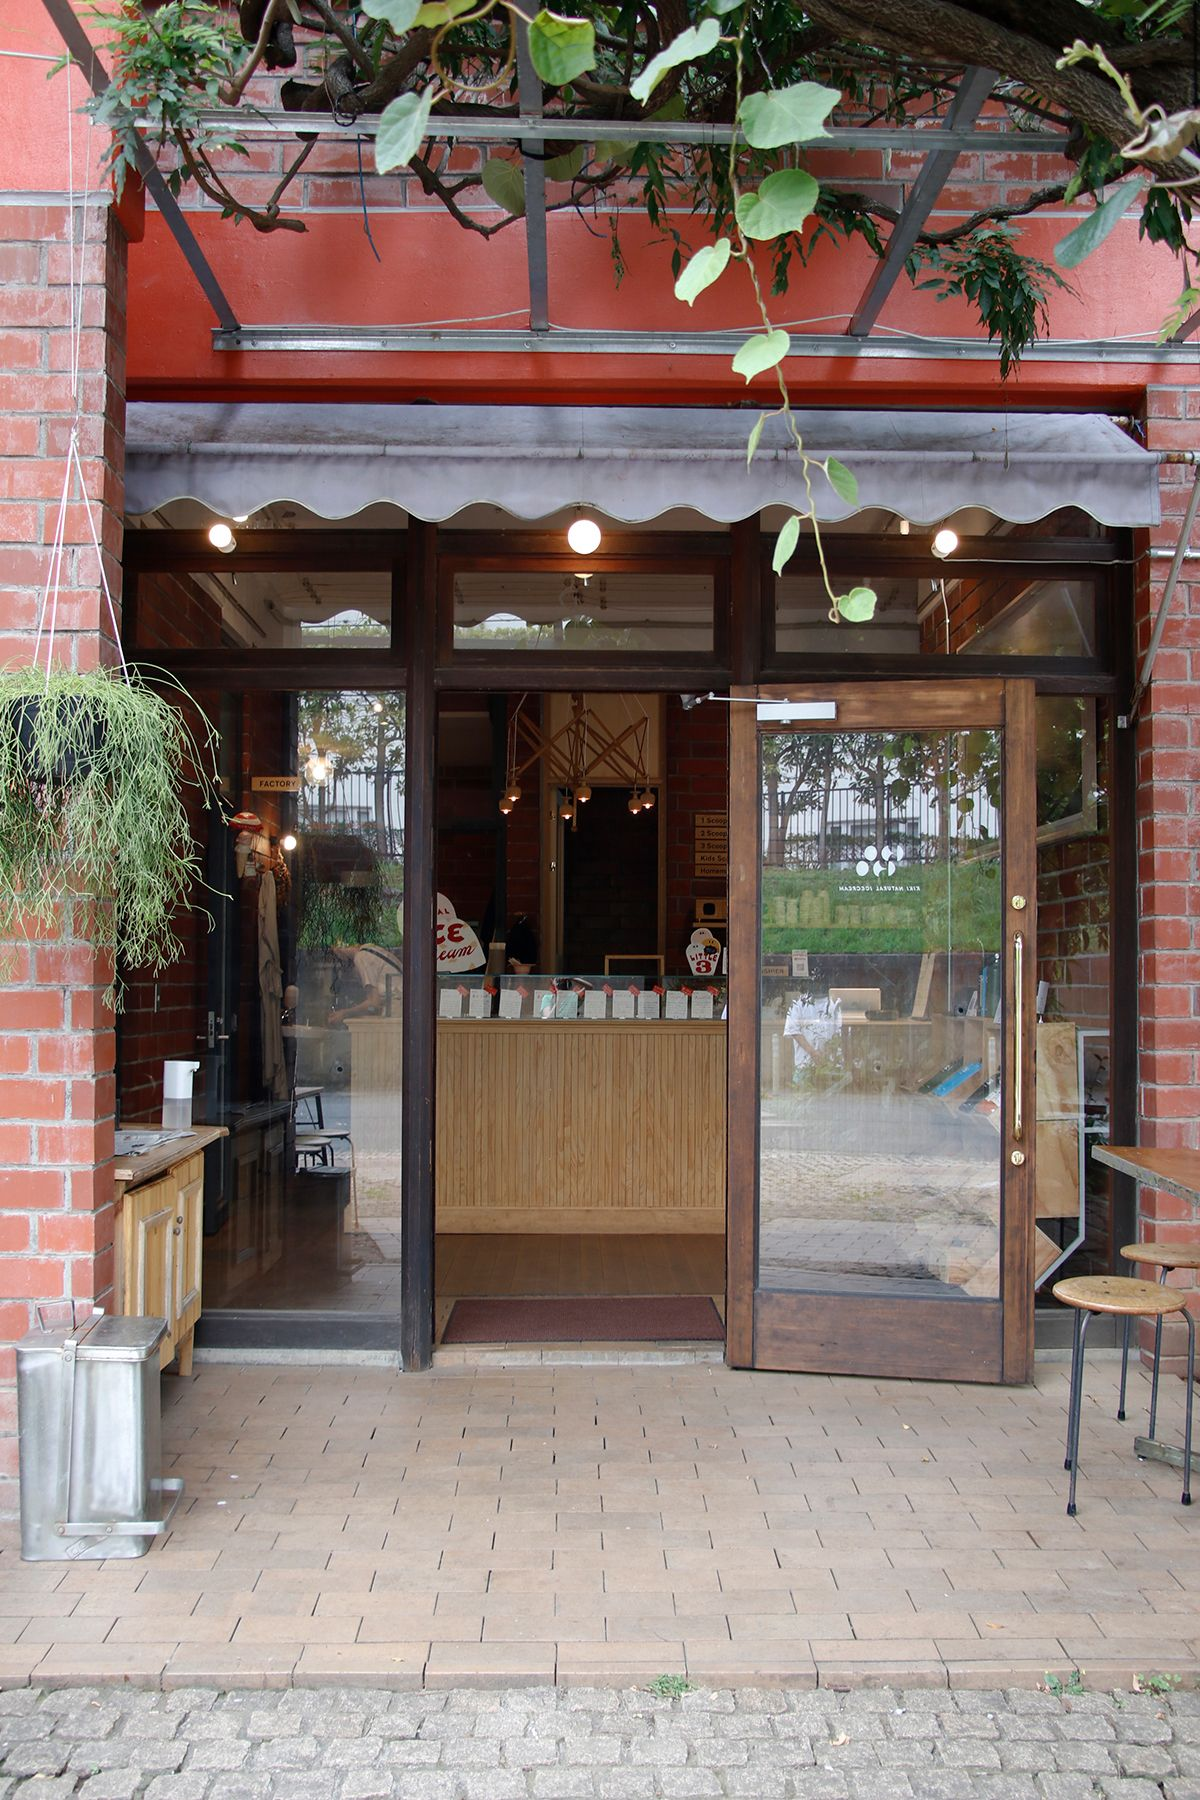 micotoya house (アイス屋/青果屋/shop)玄関は床も煉瓦